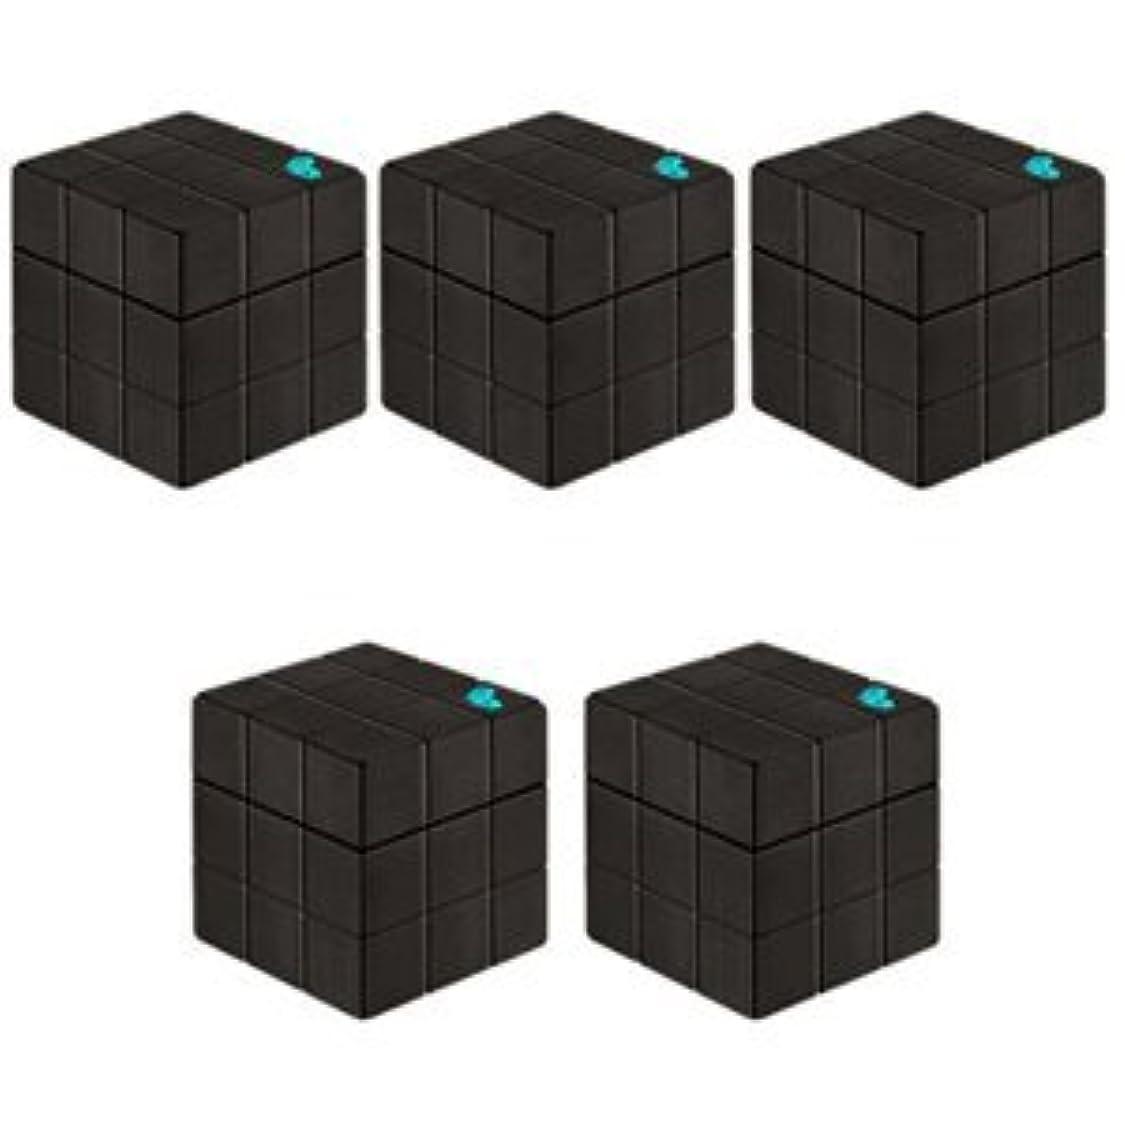 【X5個セット】 アリミノ ピース プロデザインシリーズ フリーズキープワックス ブラック 80g ARIMINO